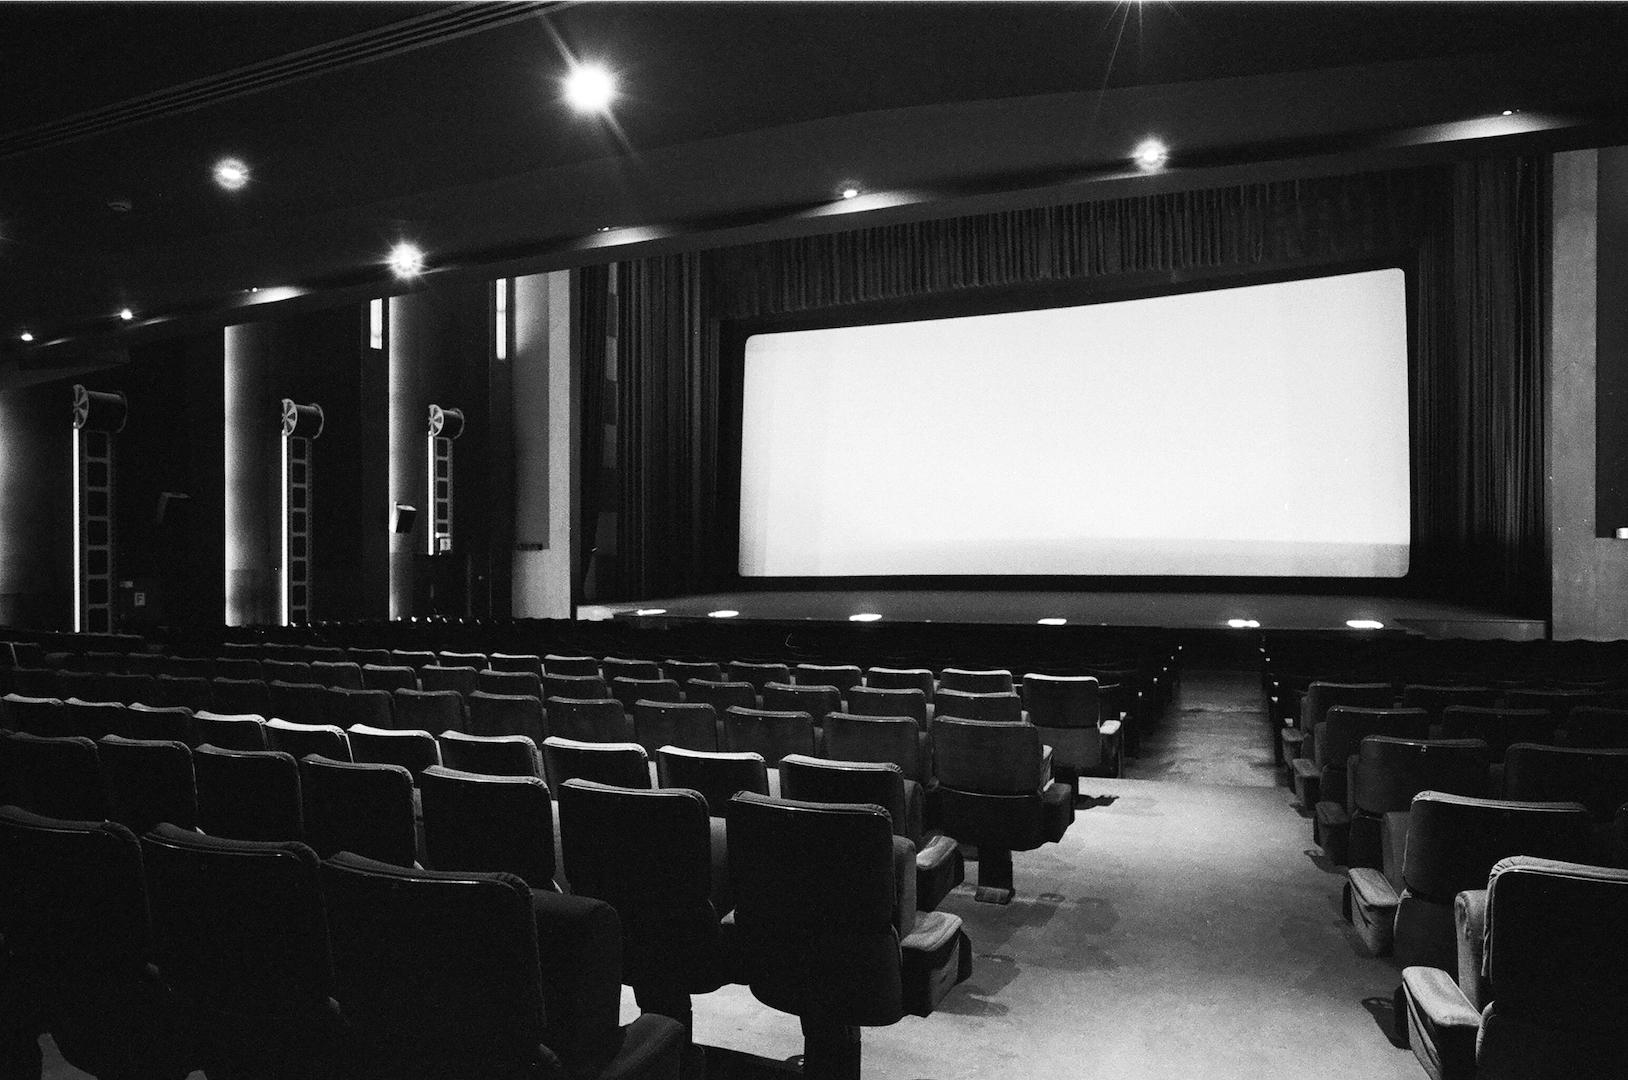 kerning-cultures-golden-cinema-7.jpg